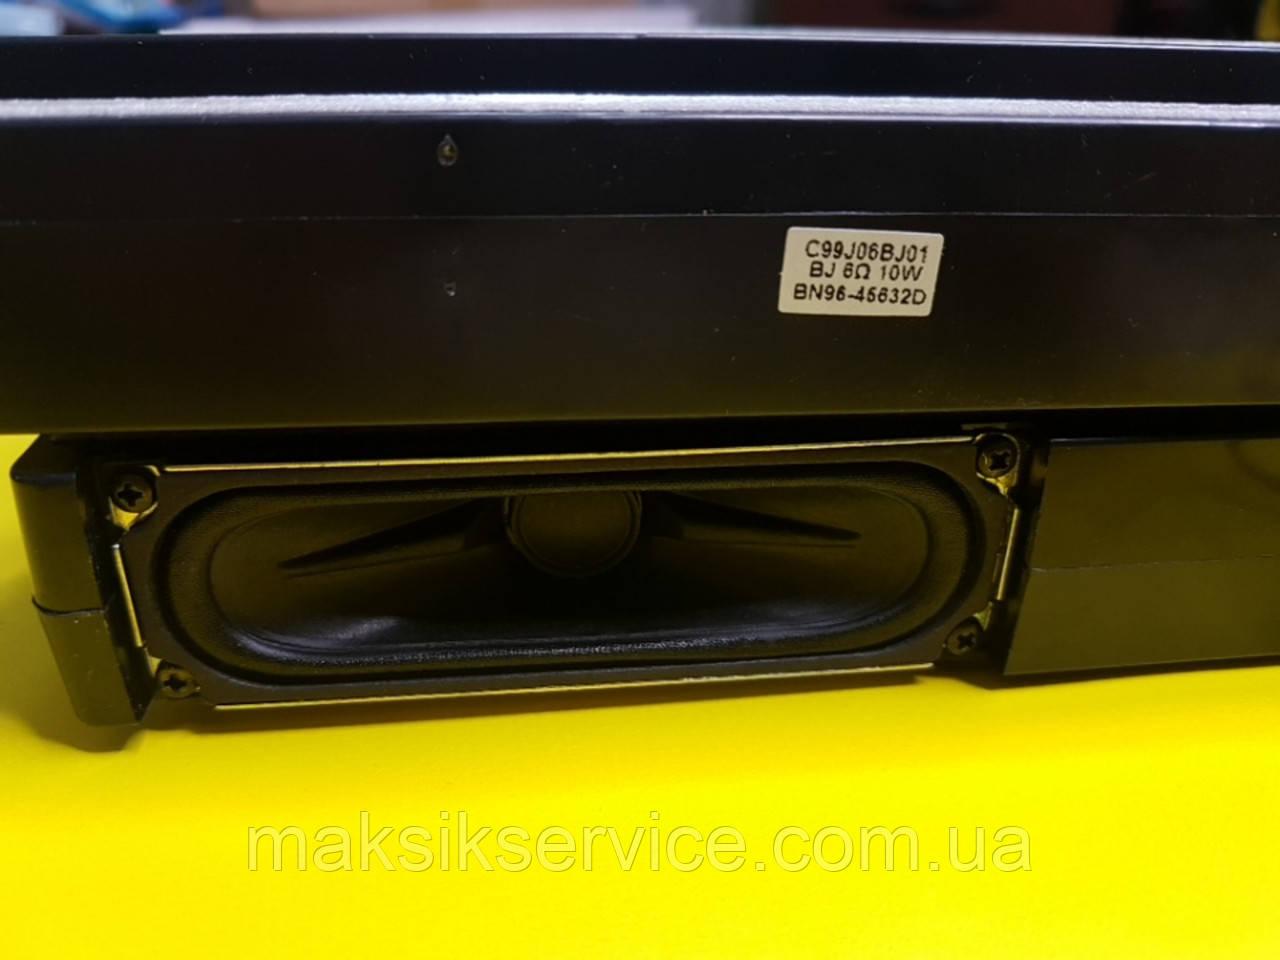 Динамики Samsung UE55NU7090U BN96-45632D